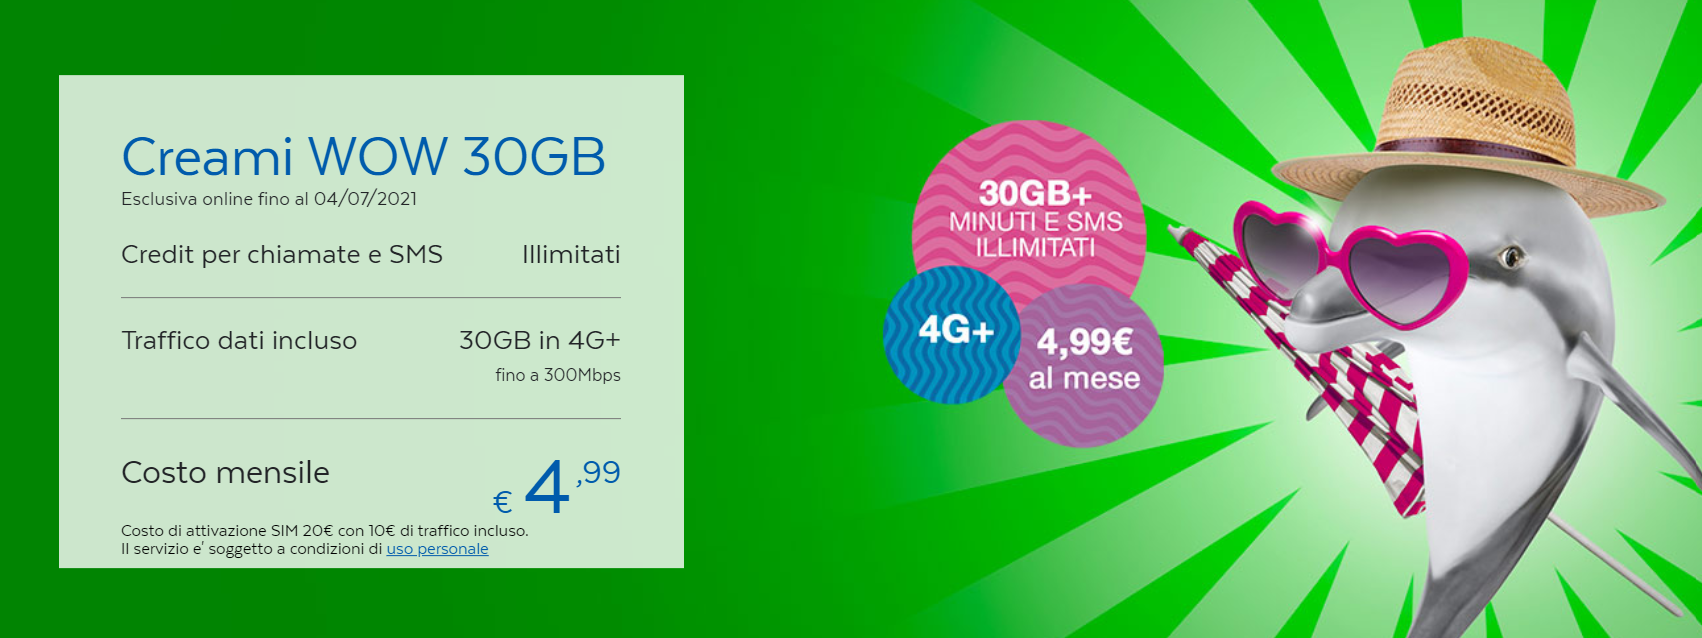 PosteMobile Creami WOW 30GB